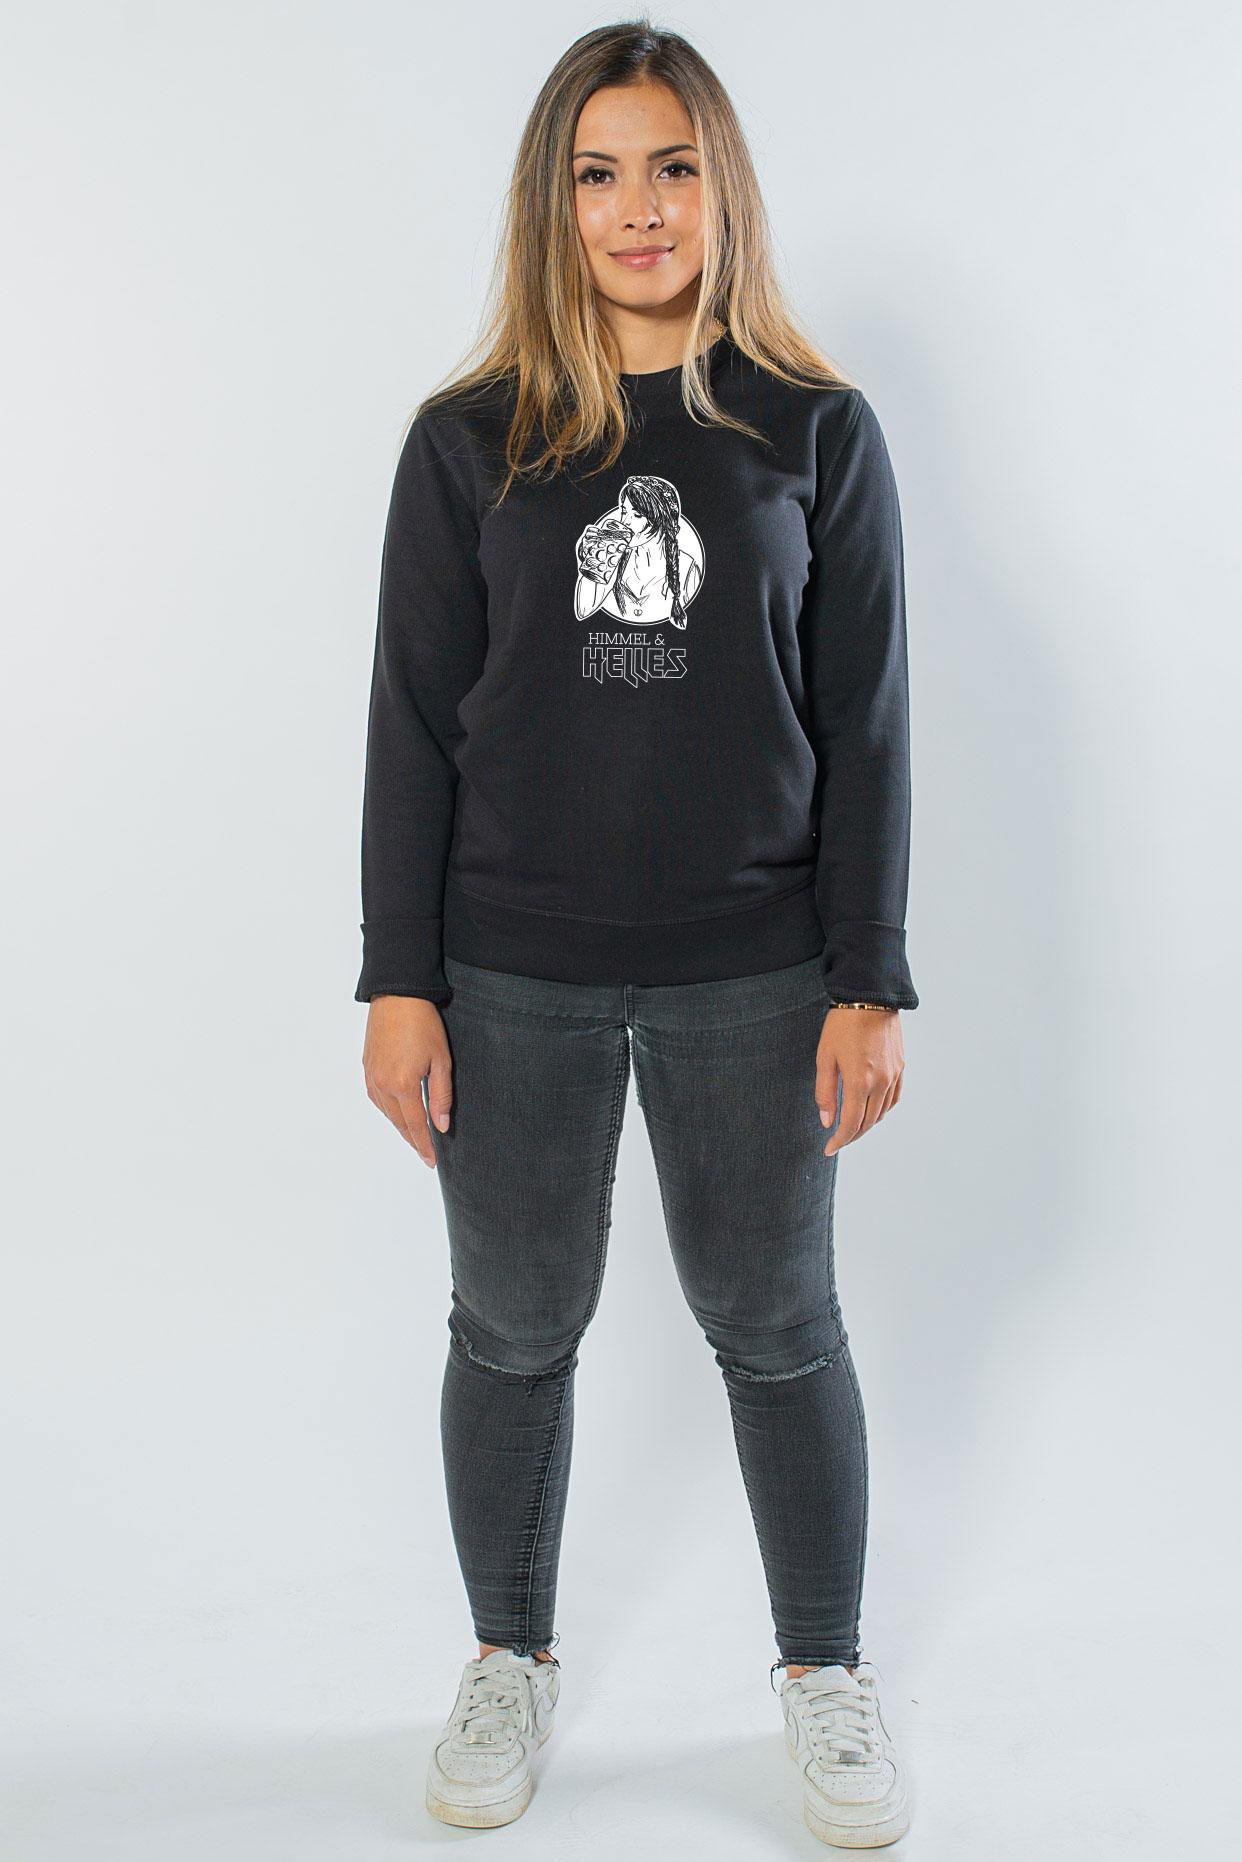 Himmel & Helles Unisex Sweater